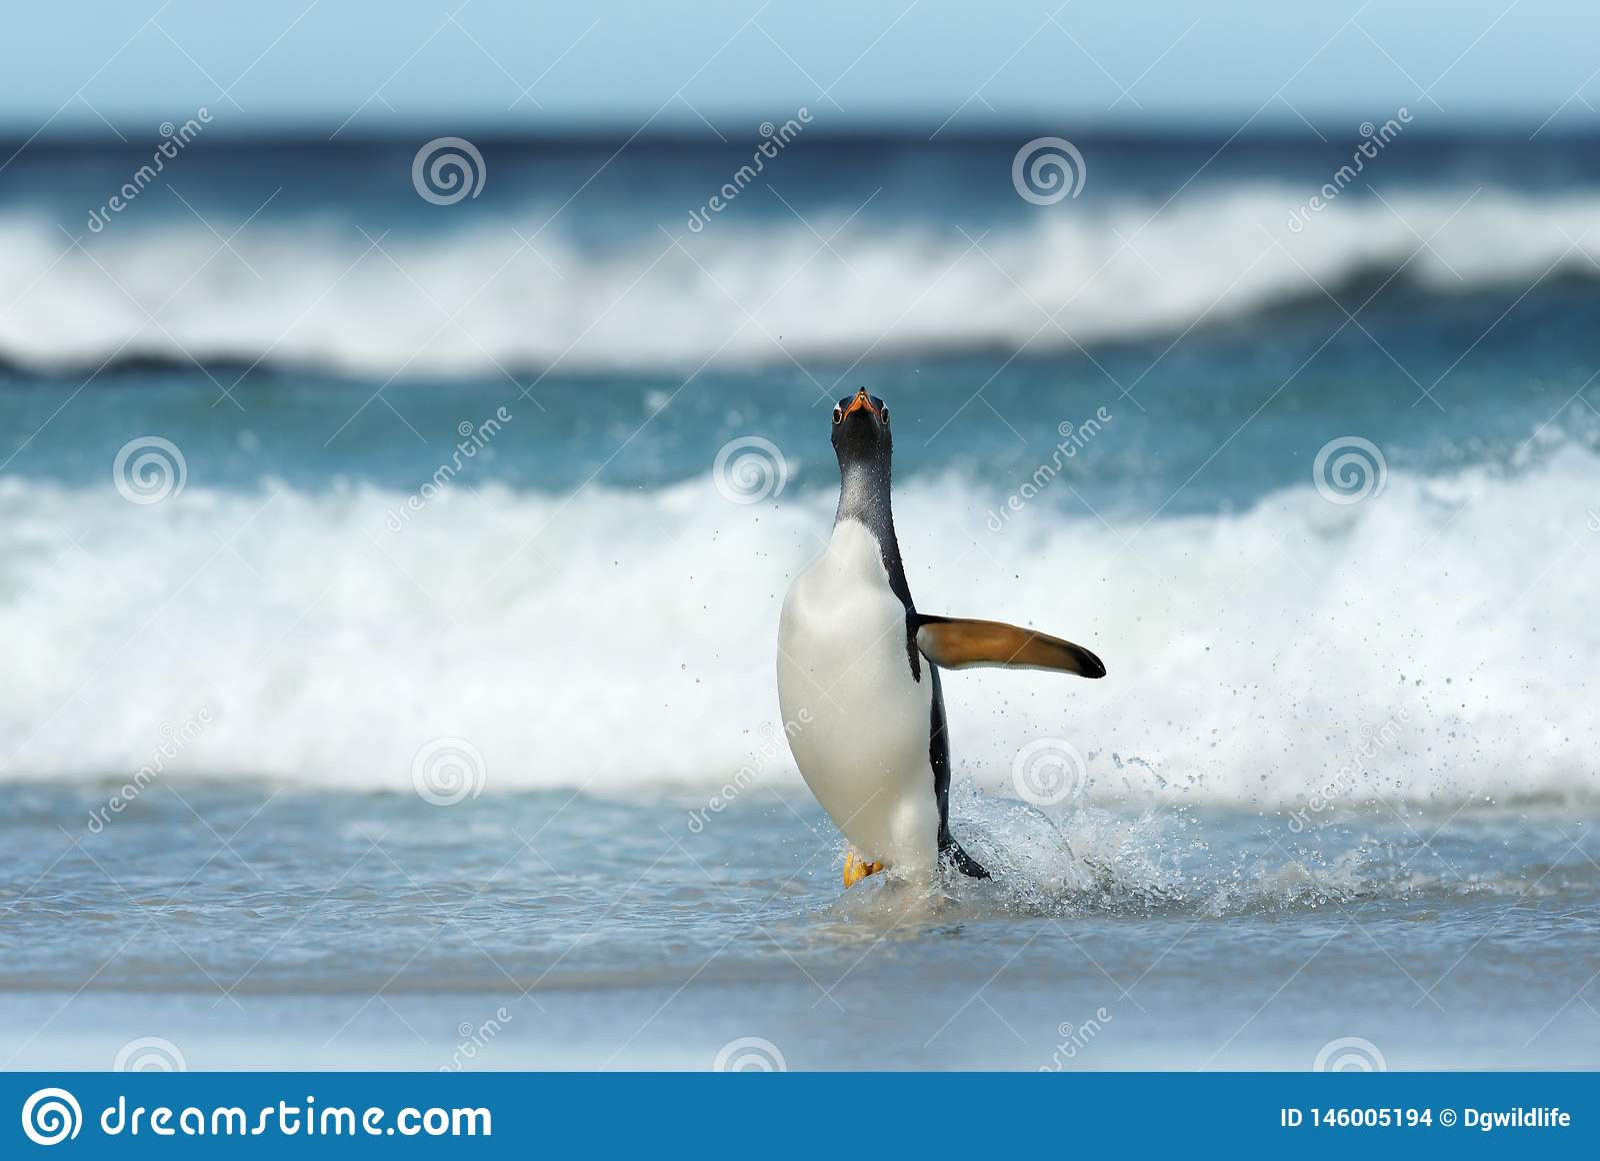 Gentoo penguin coming ashore from stormy Atlantic ocean